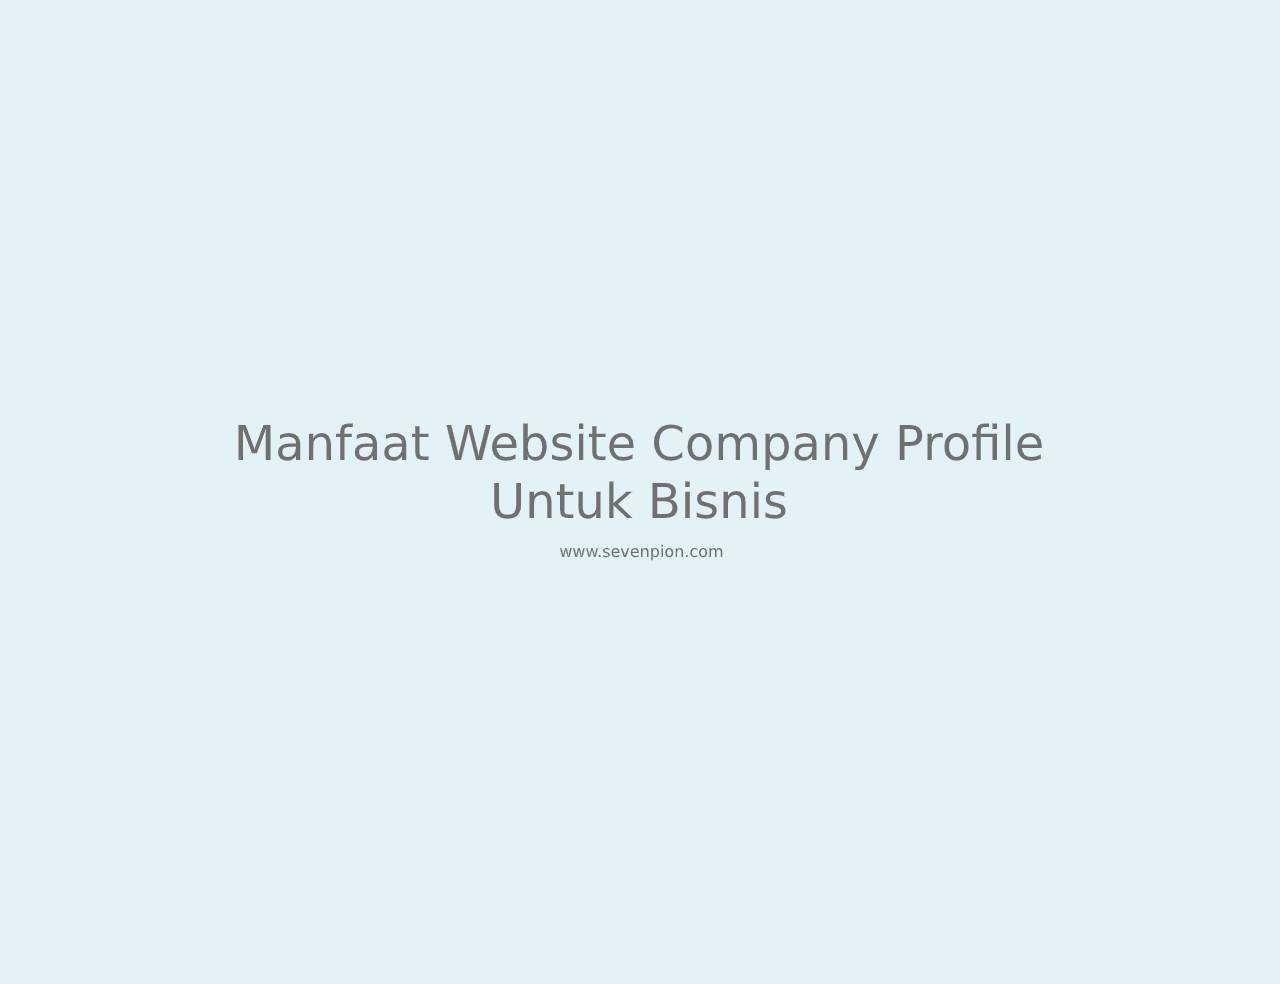 manfaat website company profile